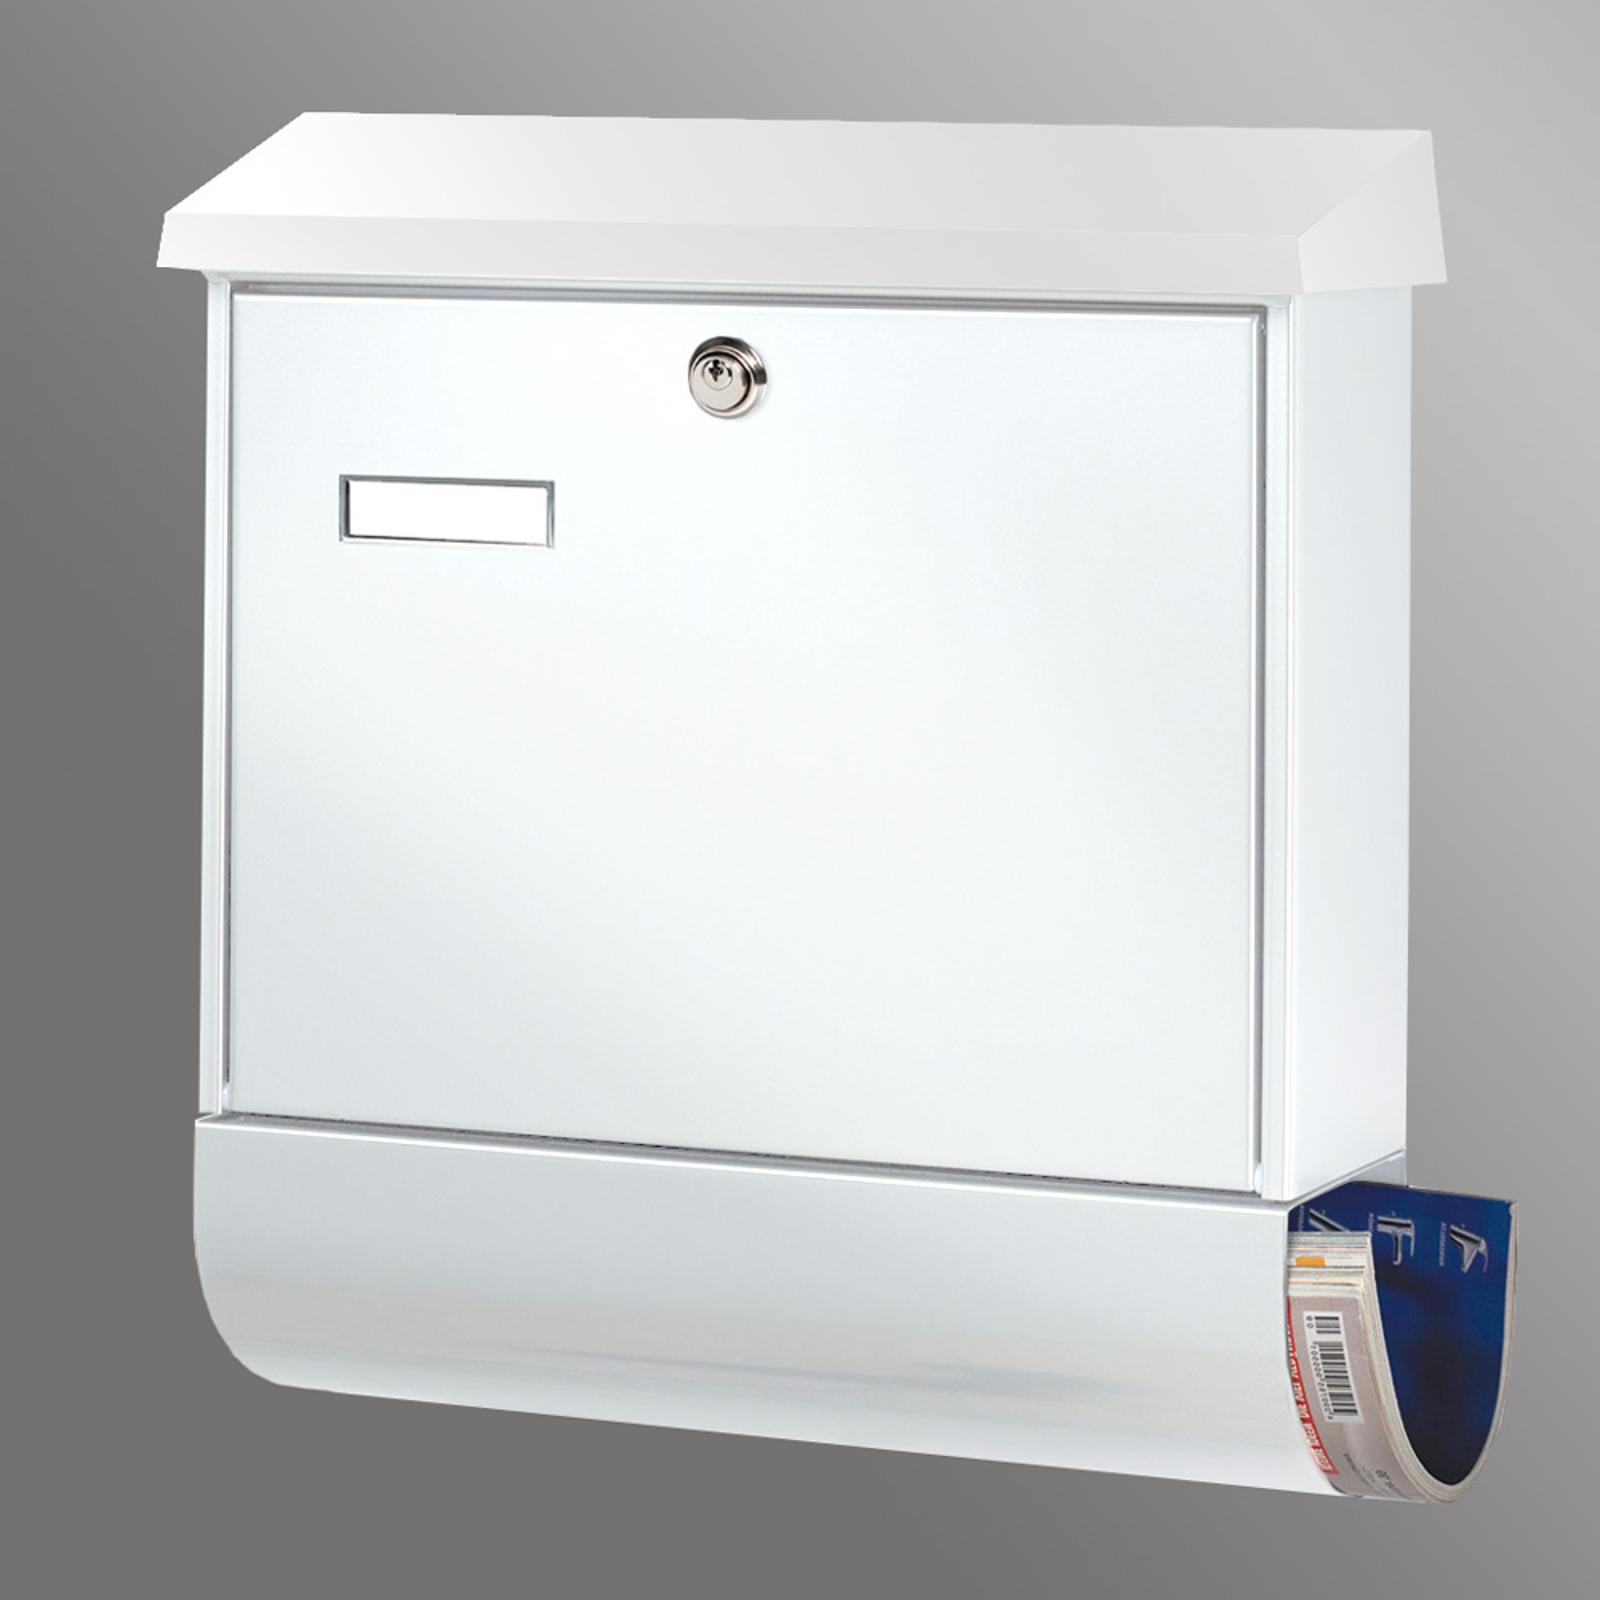 Populær SET VARIO postkasse i hvitt